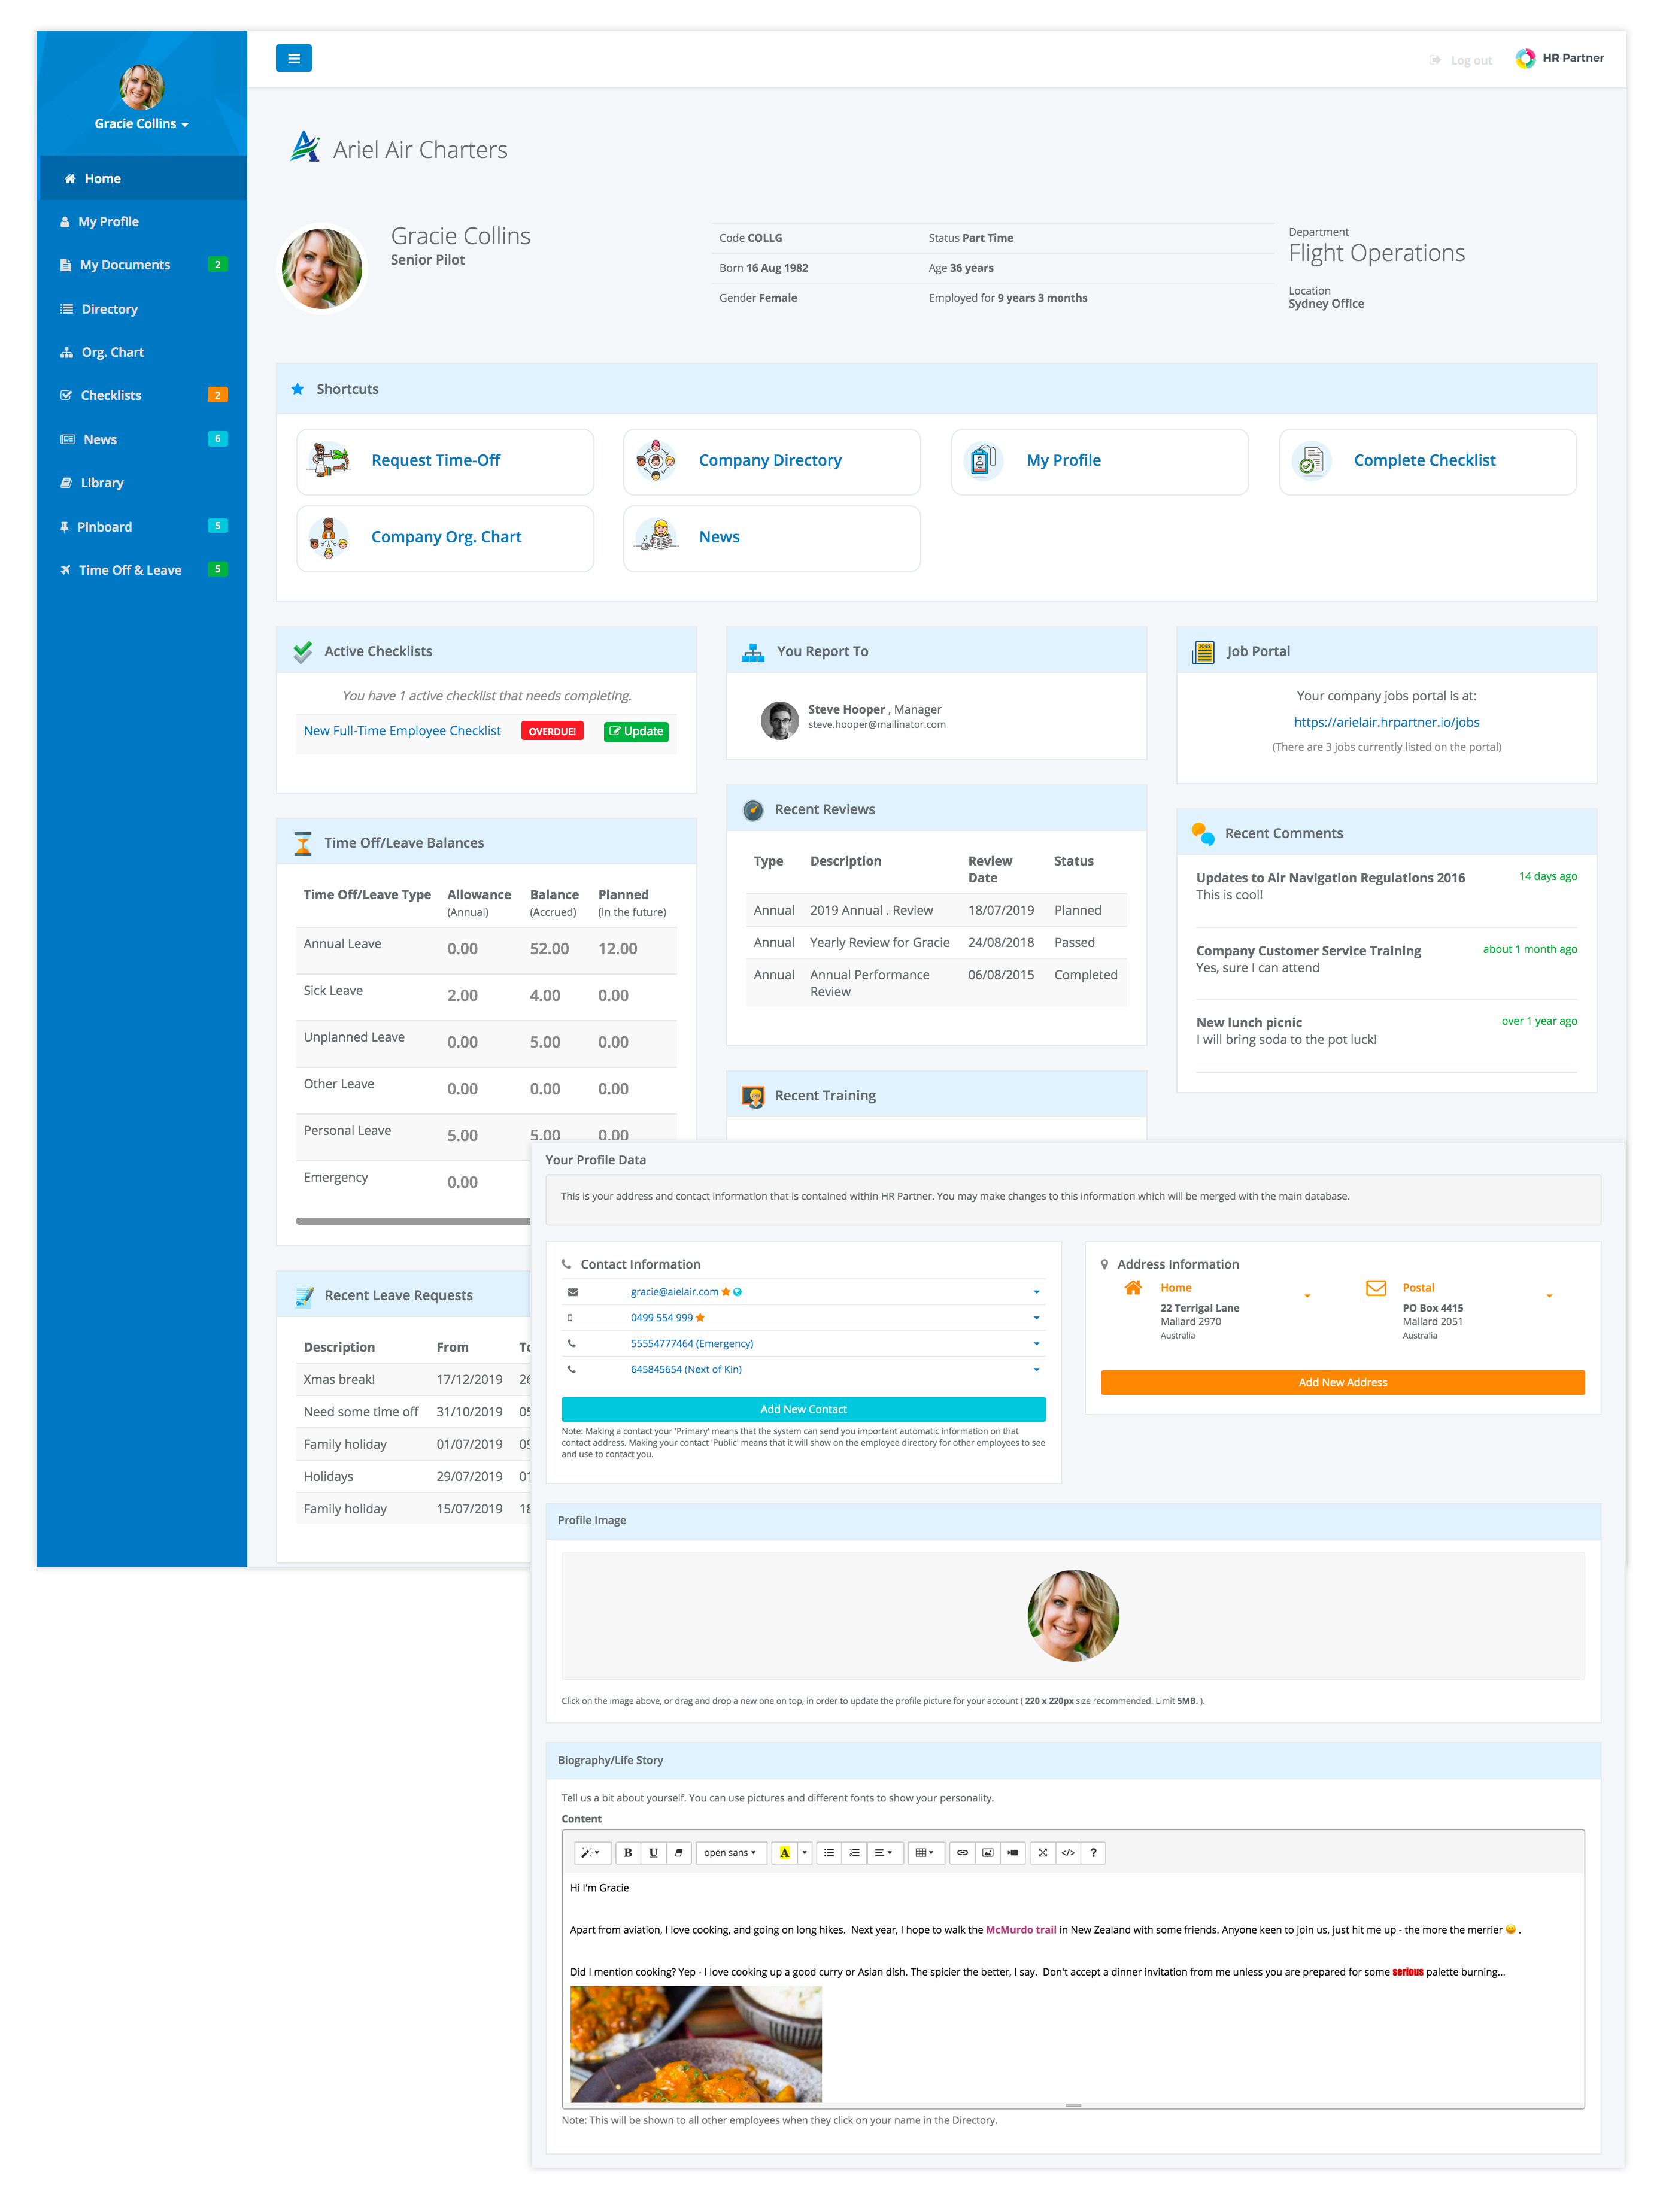 HR Partner Employee Portal